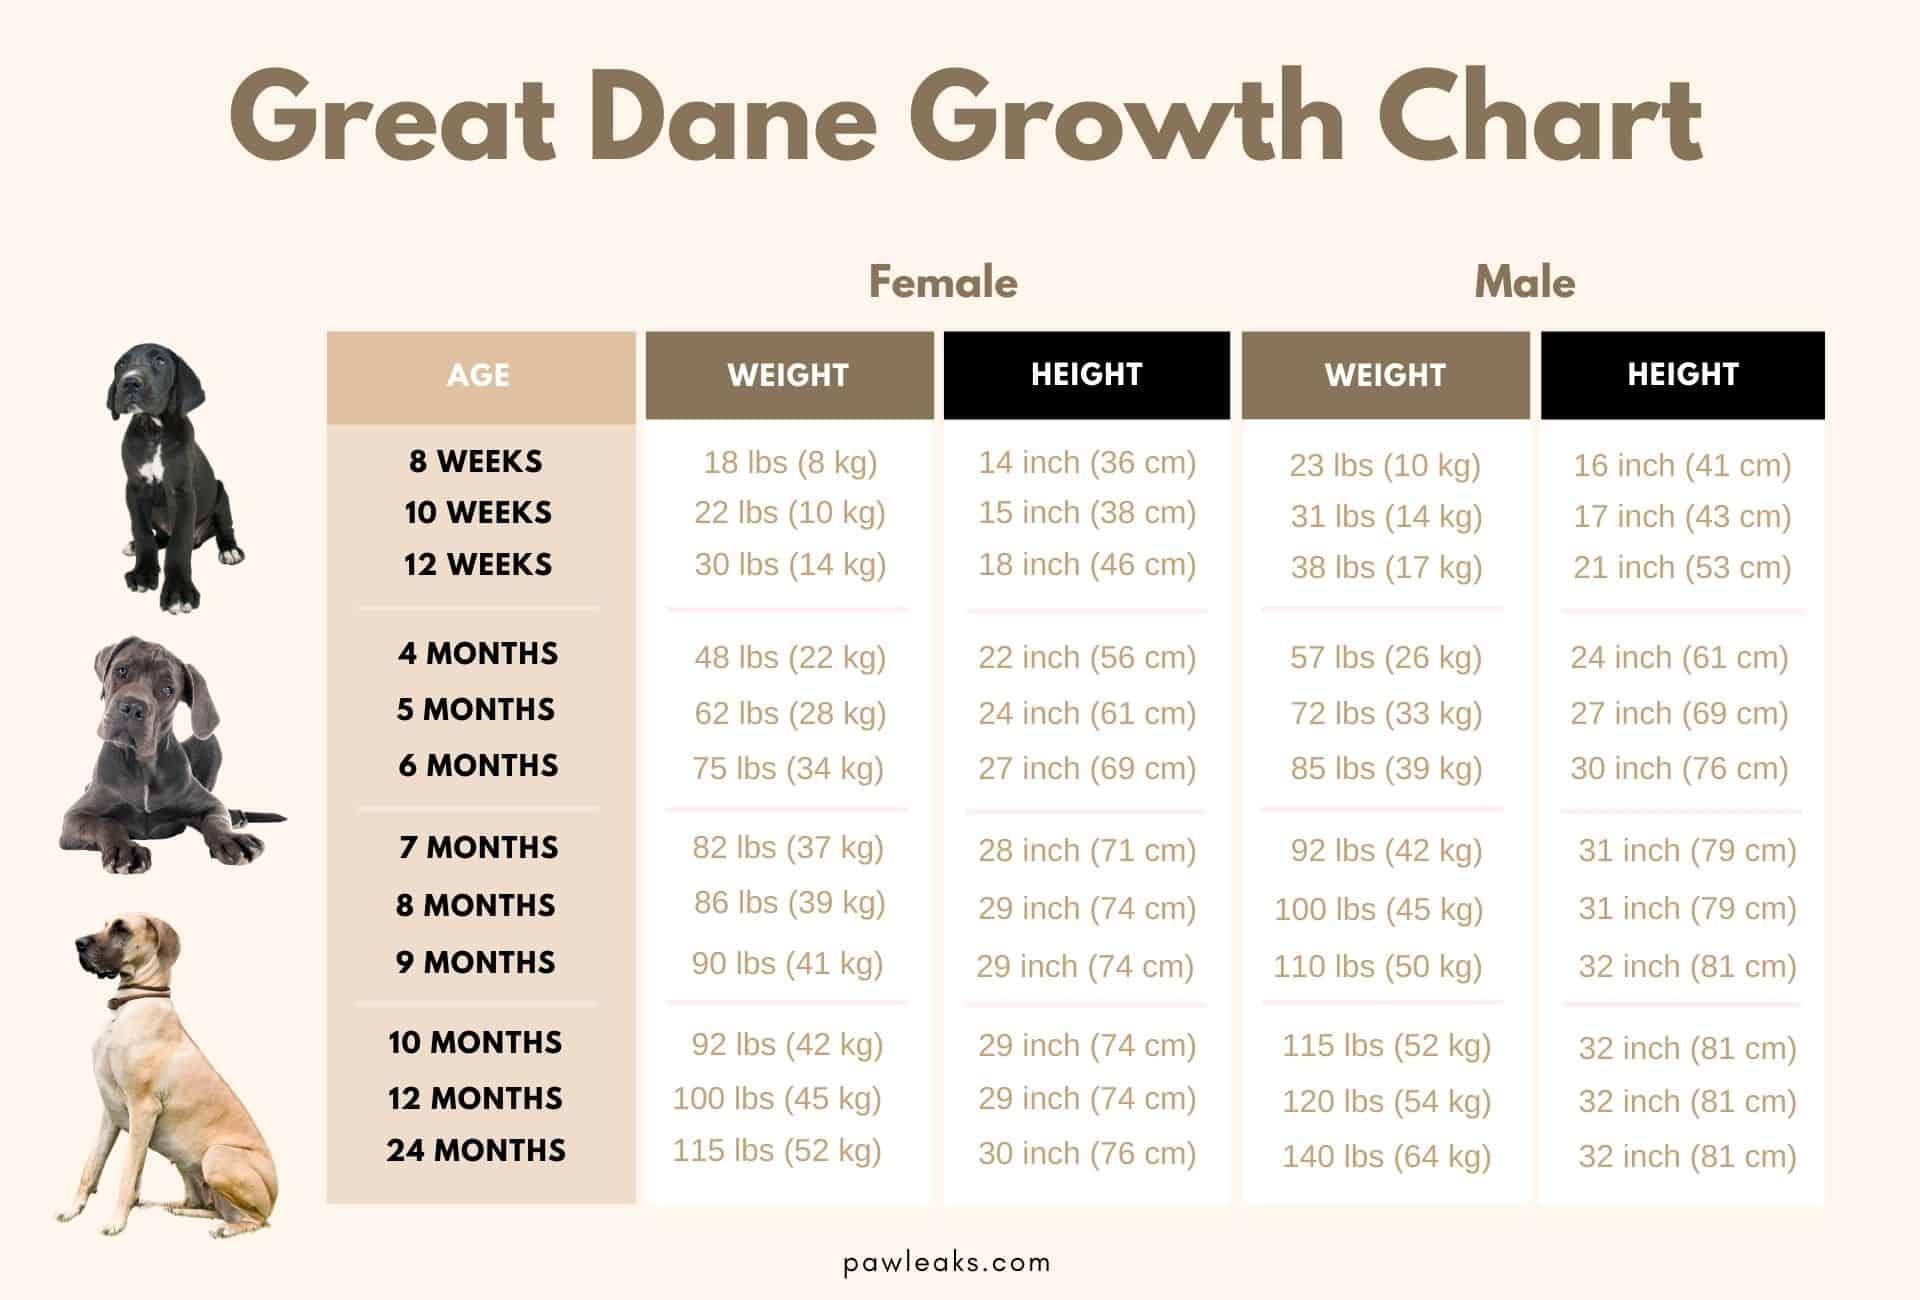 GreatDane growth chart